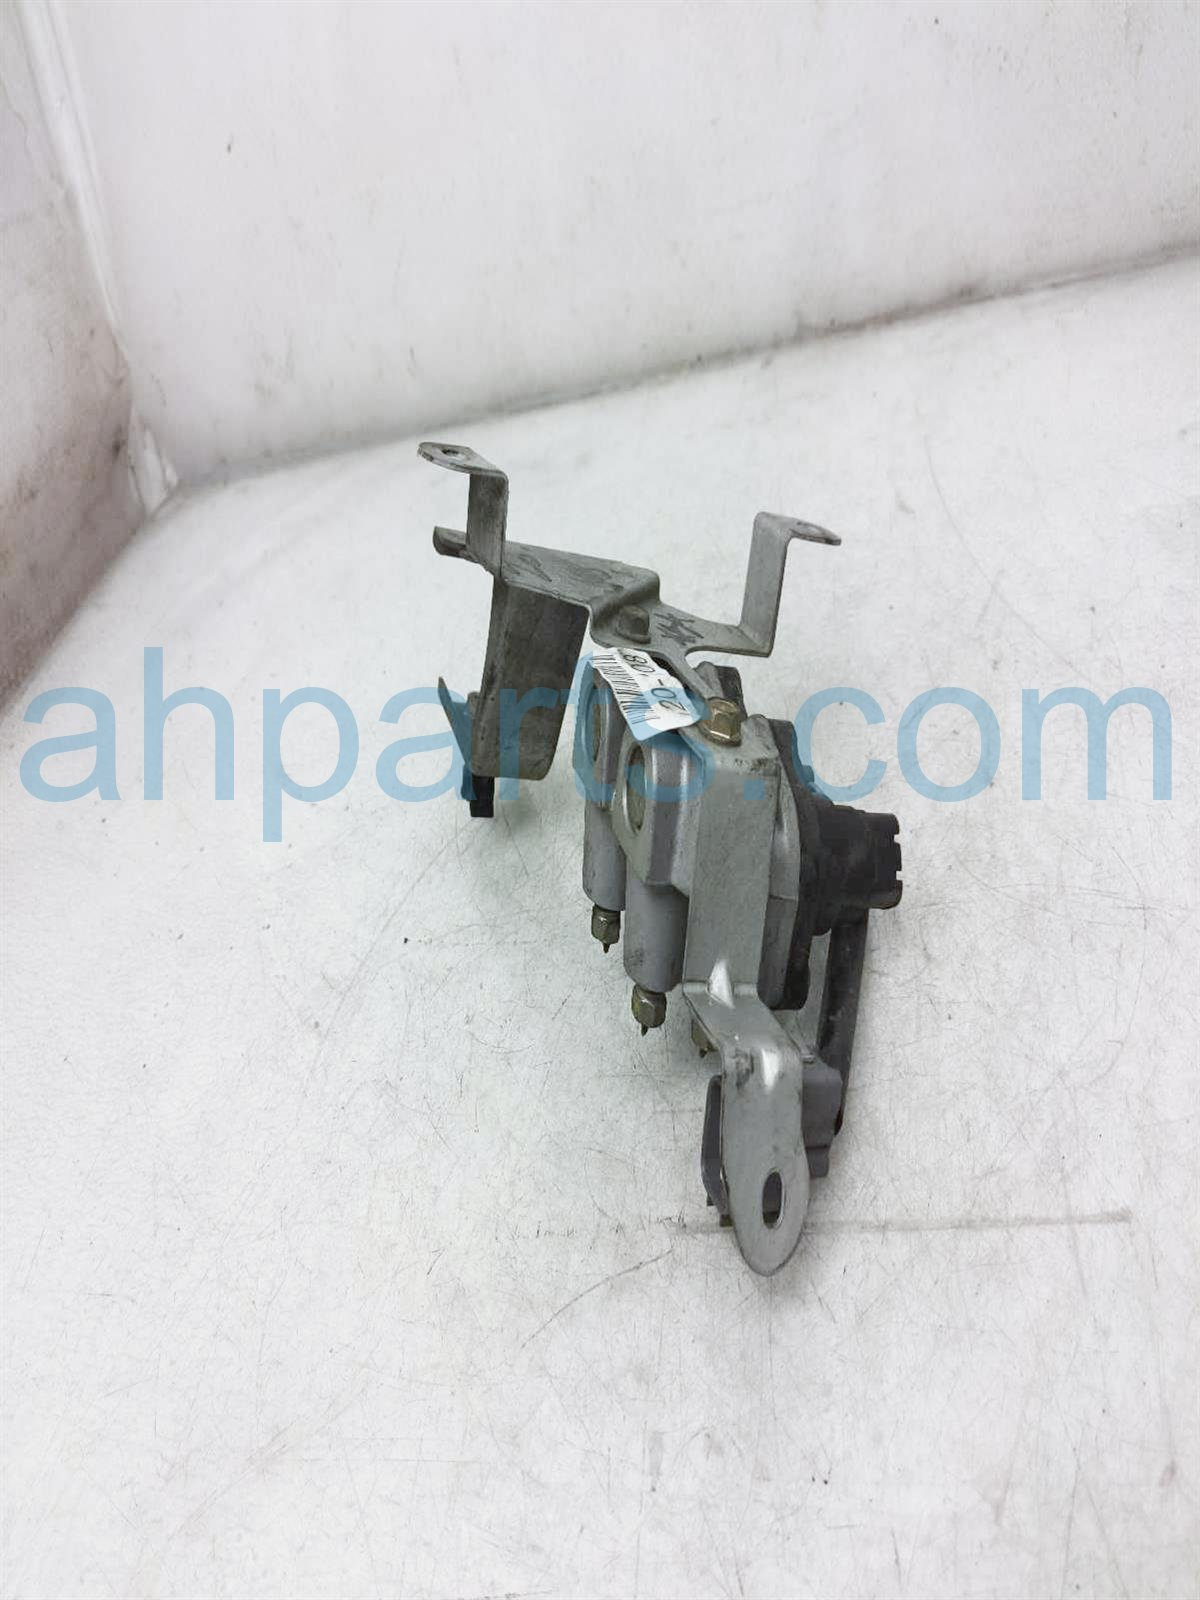 2003 Honda Insight Abs/vsa / Pump (anti Lock Brake) Creep Aid Modulator (abs) 57605 S3Y A00 Replacement